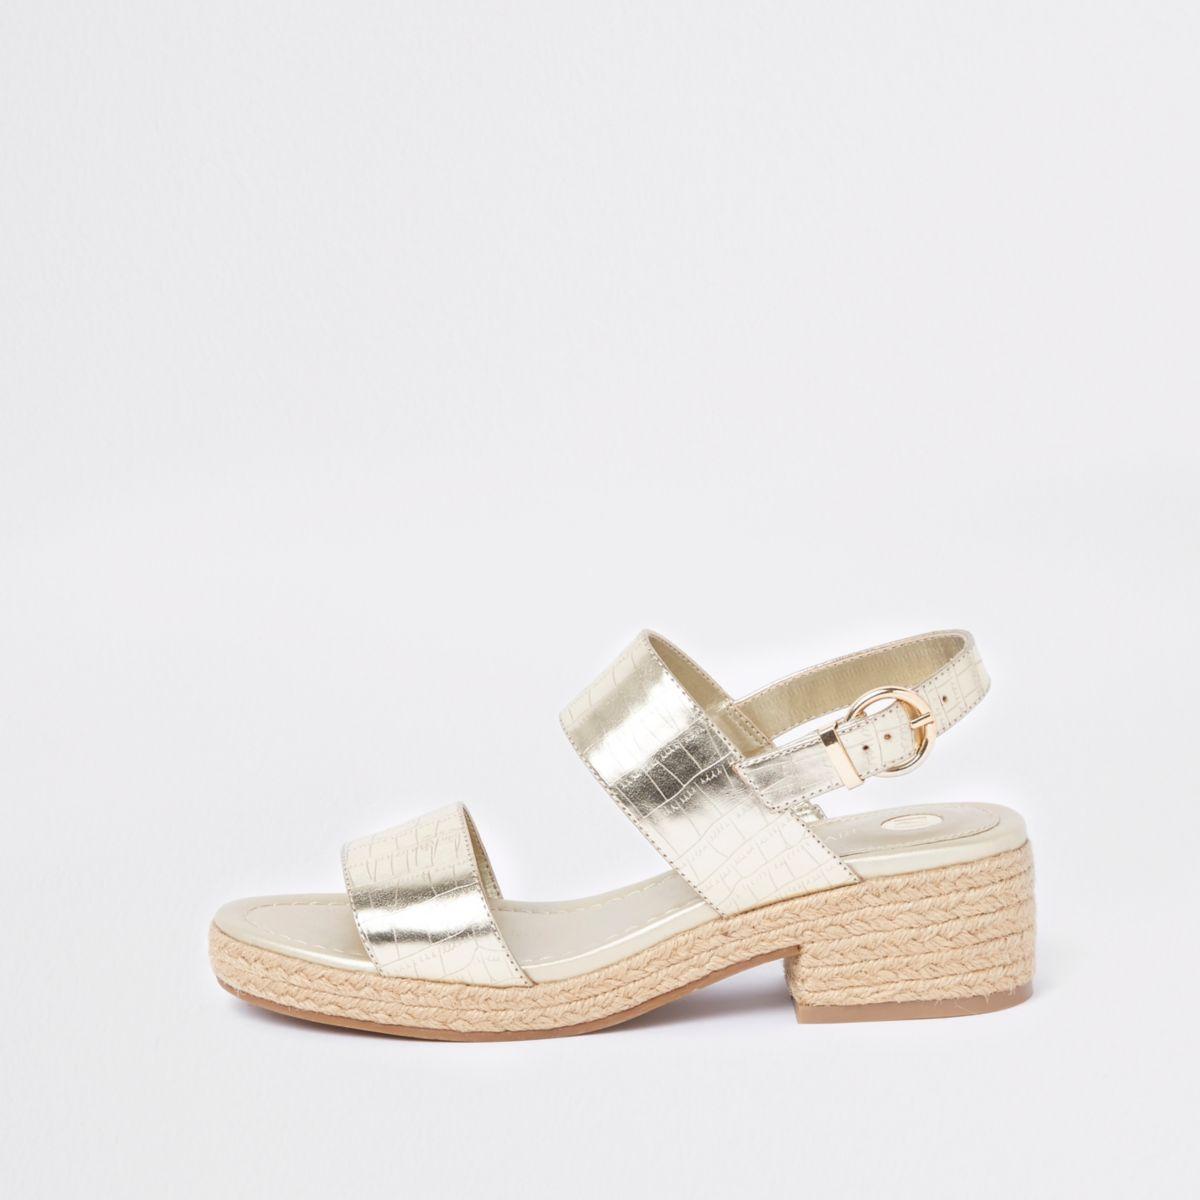 River Island Womens metallic two part espadrille sandals r180gq7